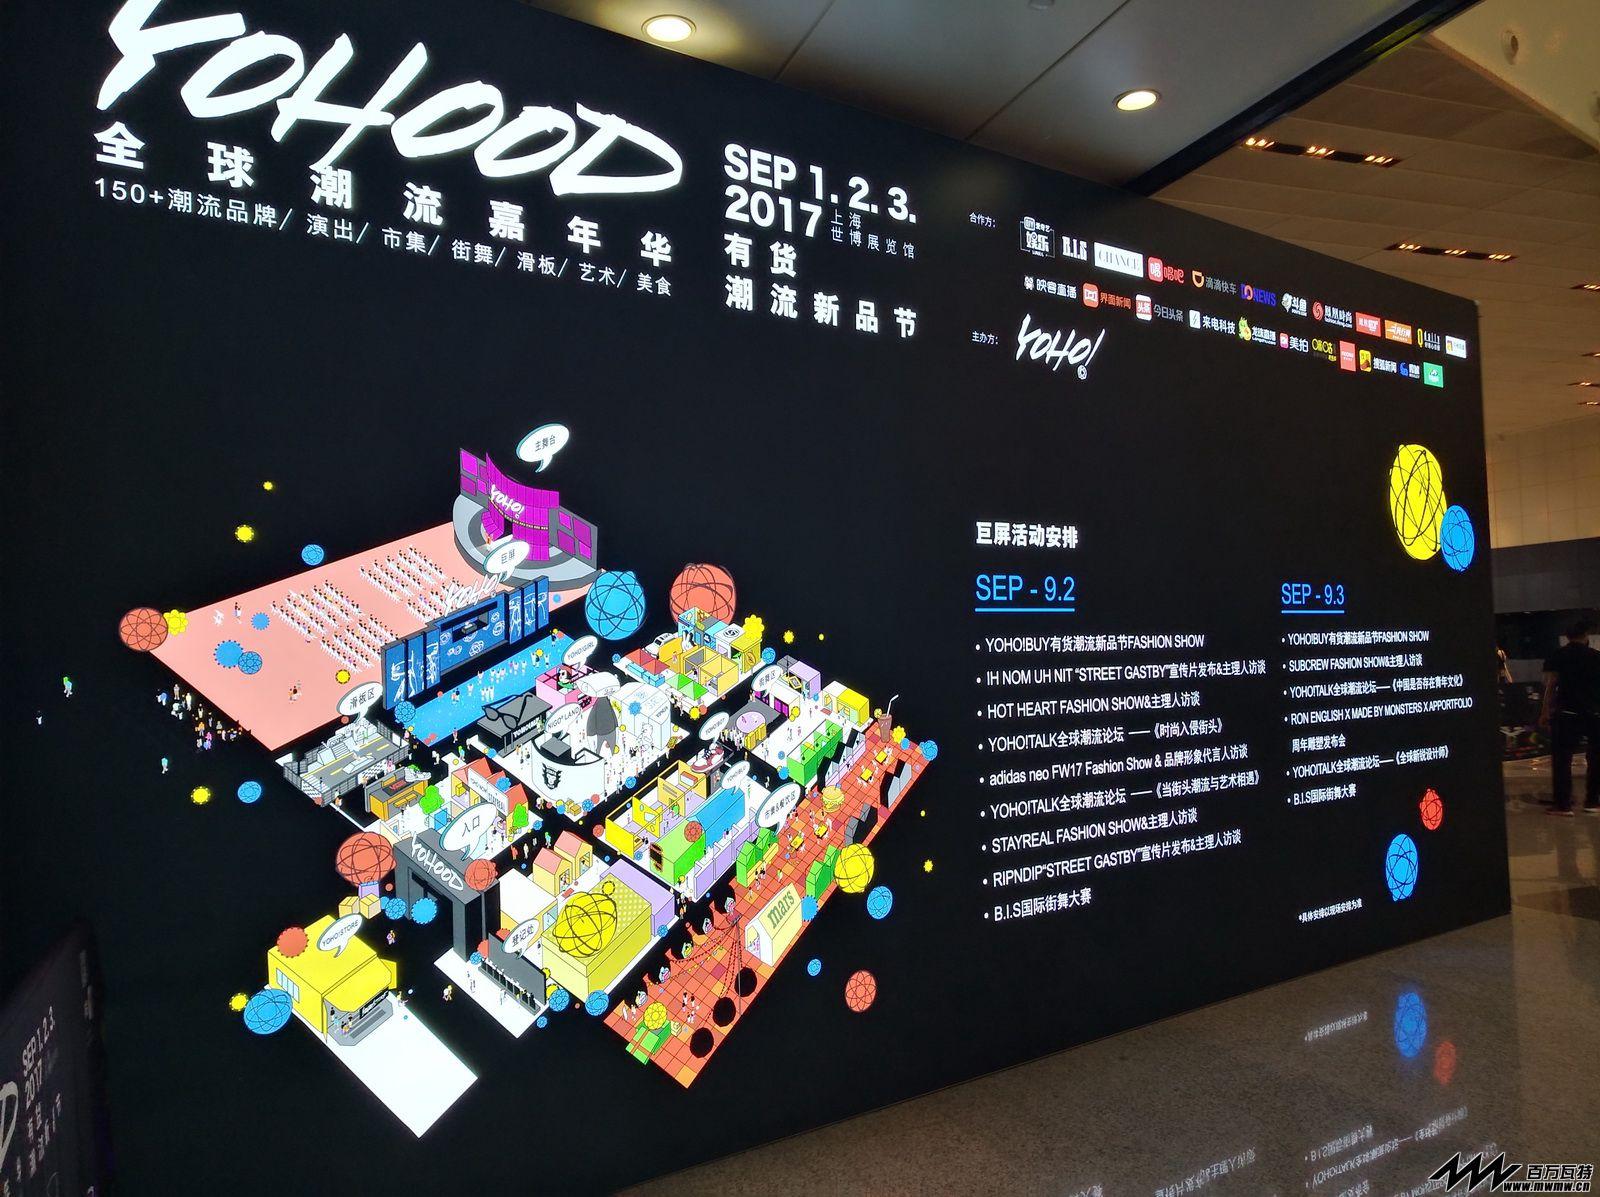 YOHOOD全球潮流嘉年华暨有货潮流新品节 (10).jpg